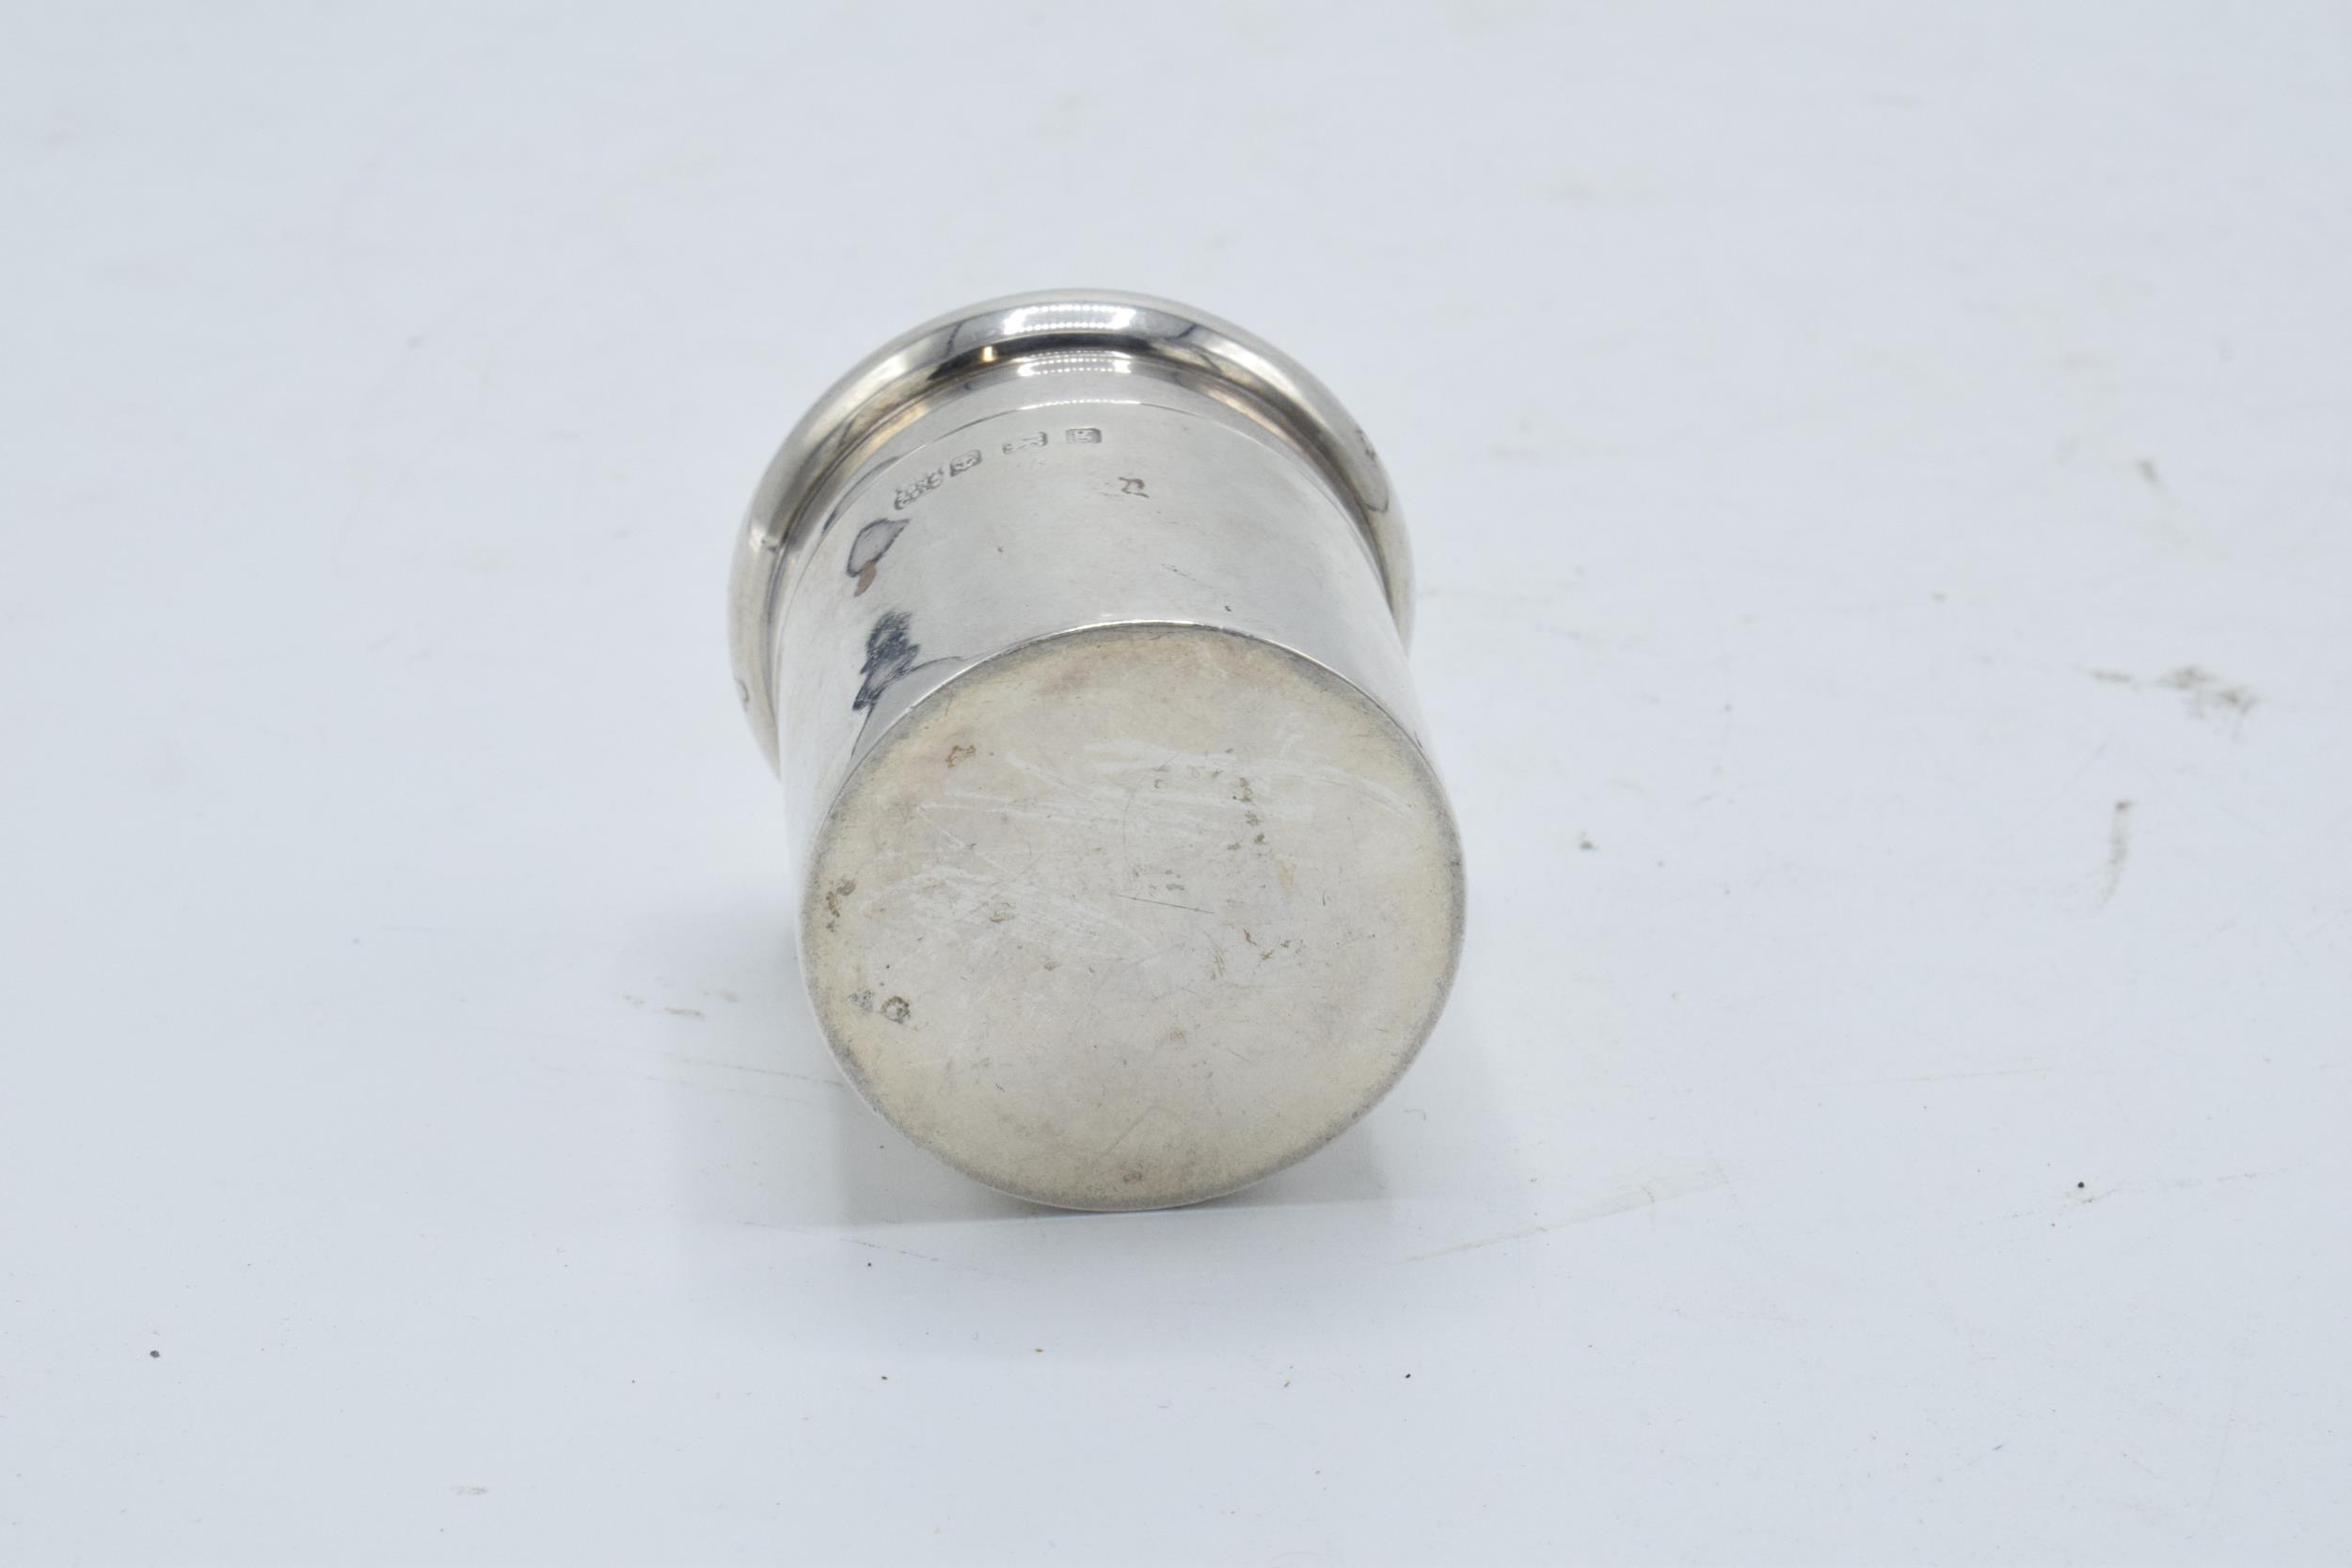 Silver cylindrical lidded pot/ box. Birmingham 1906. 45.4 grams. 5.5cm tall. - Image 4 of 4